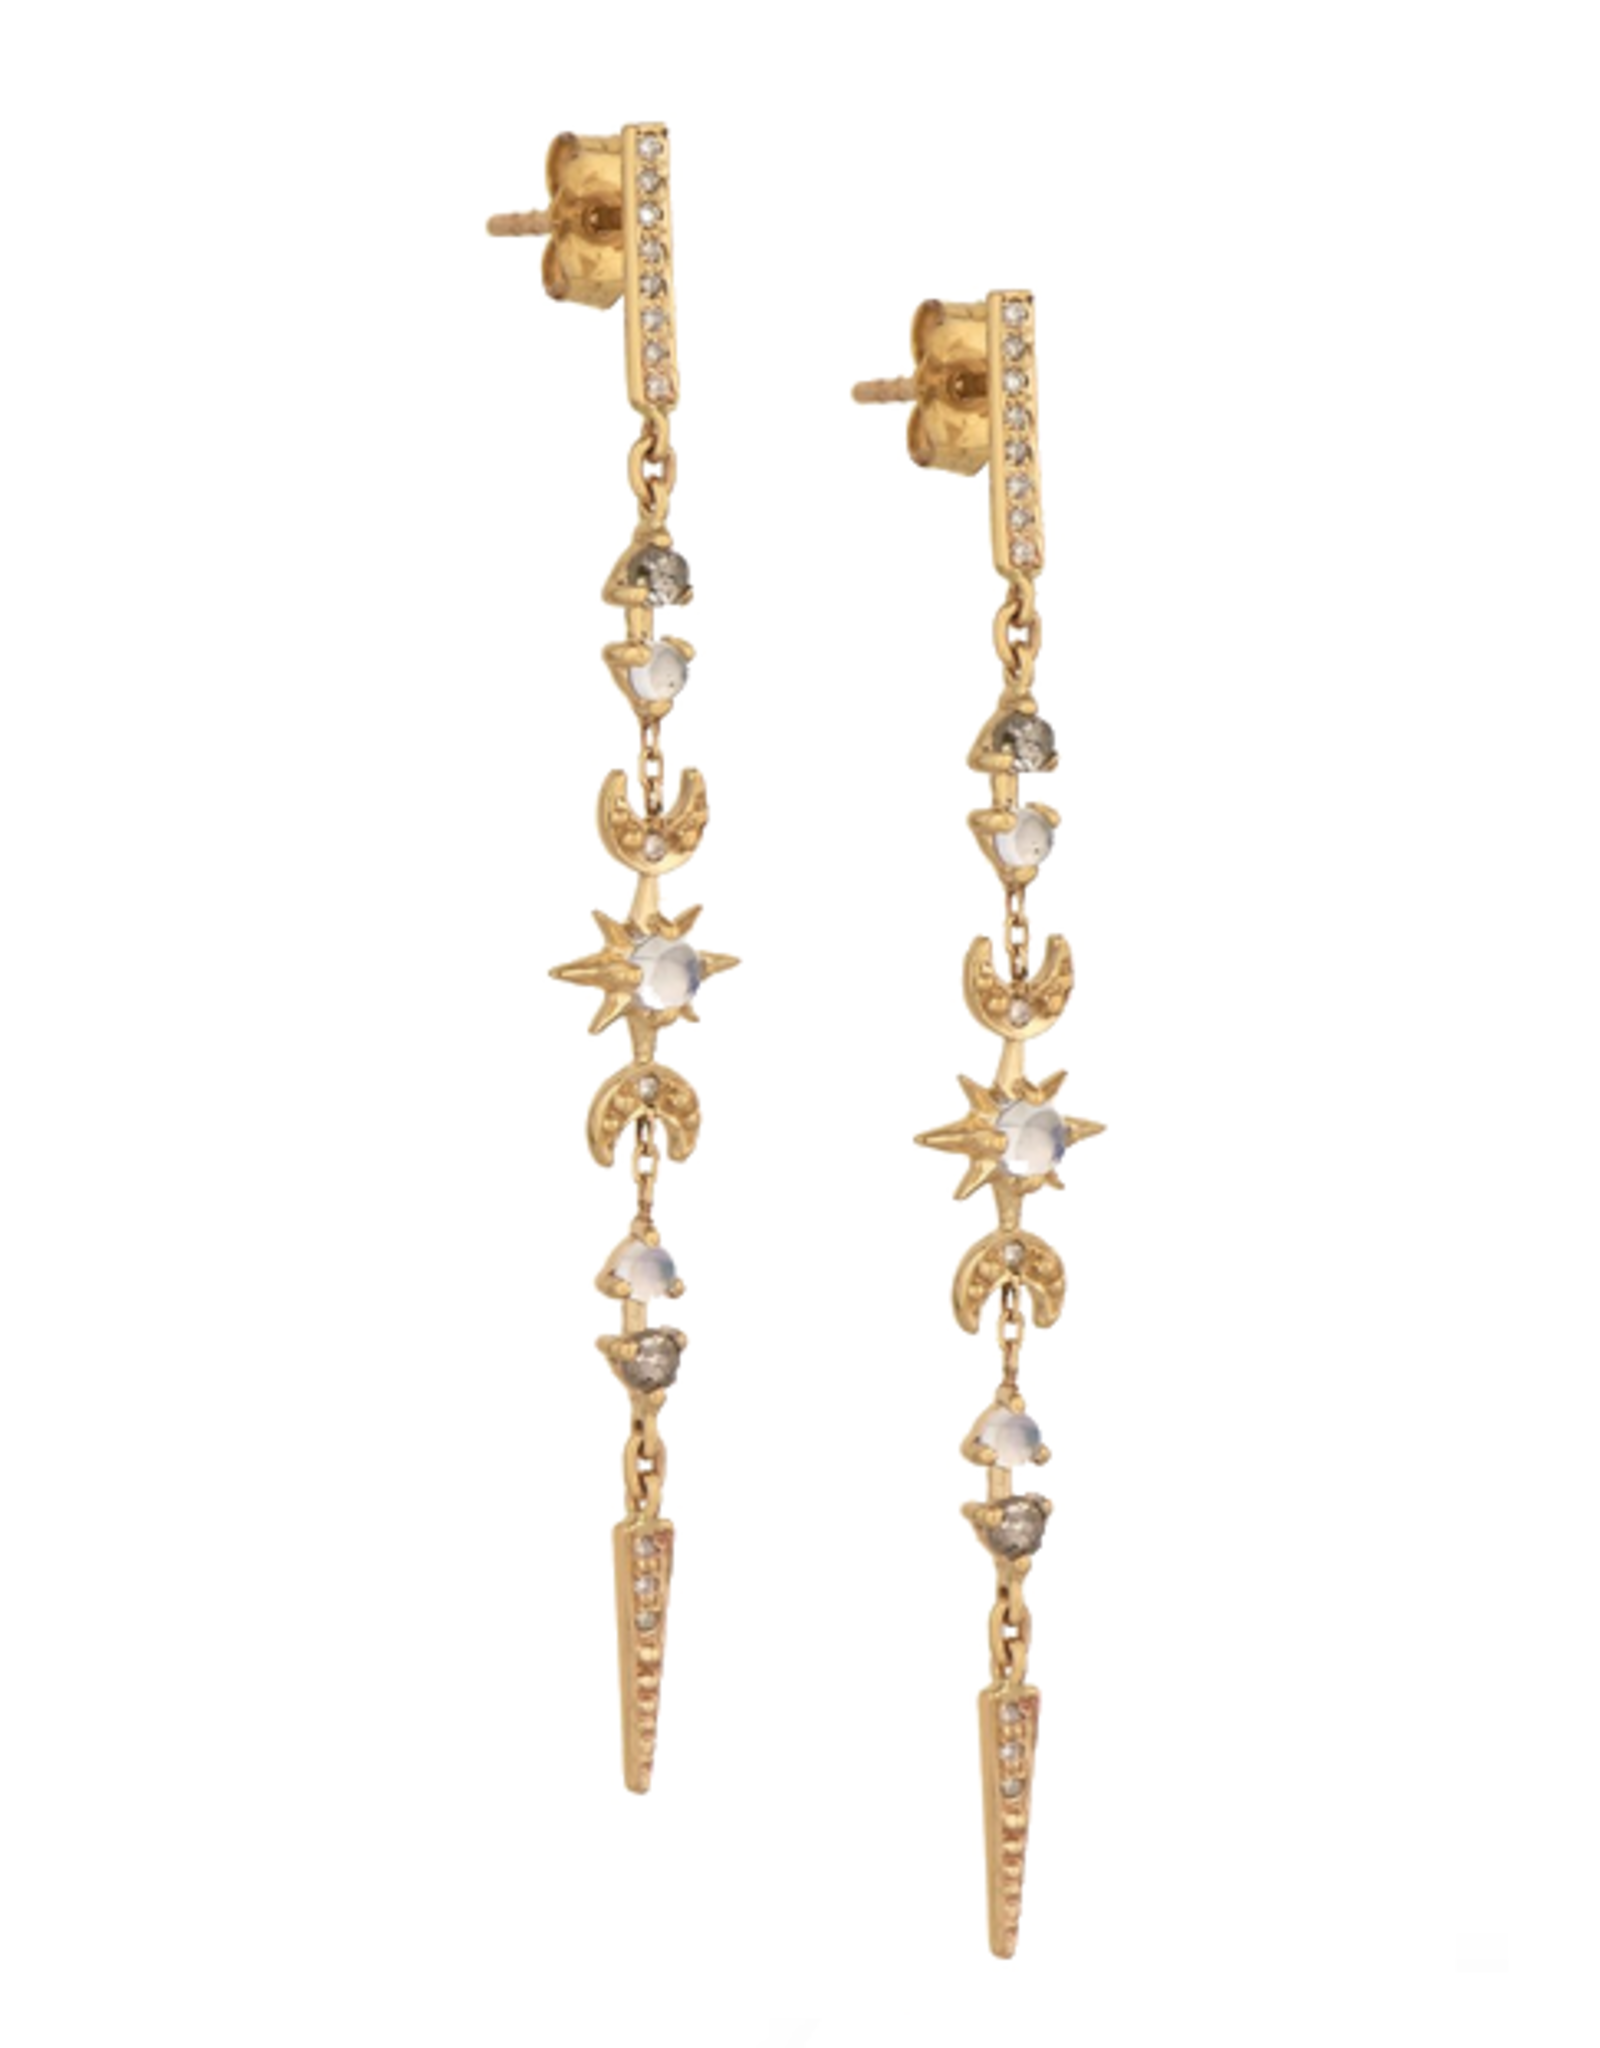 Celine Daoust Moon + Sun Long Chain Earrings - Moonstones + Diamonds